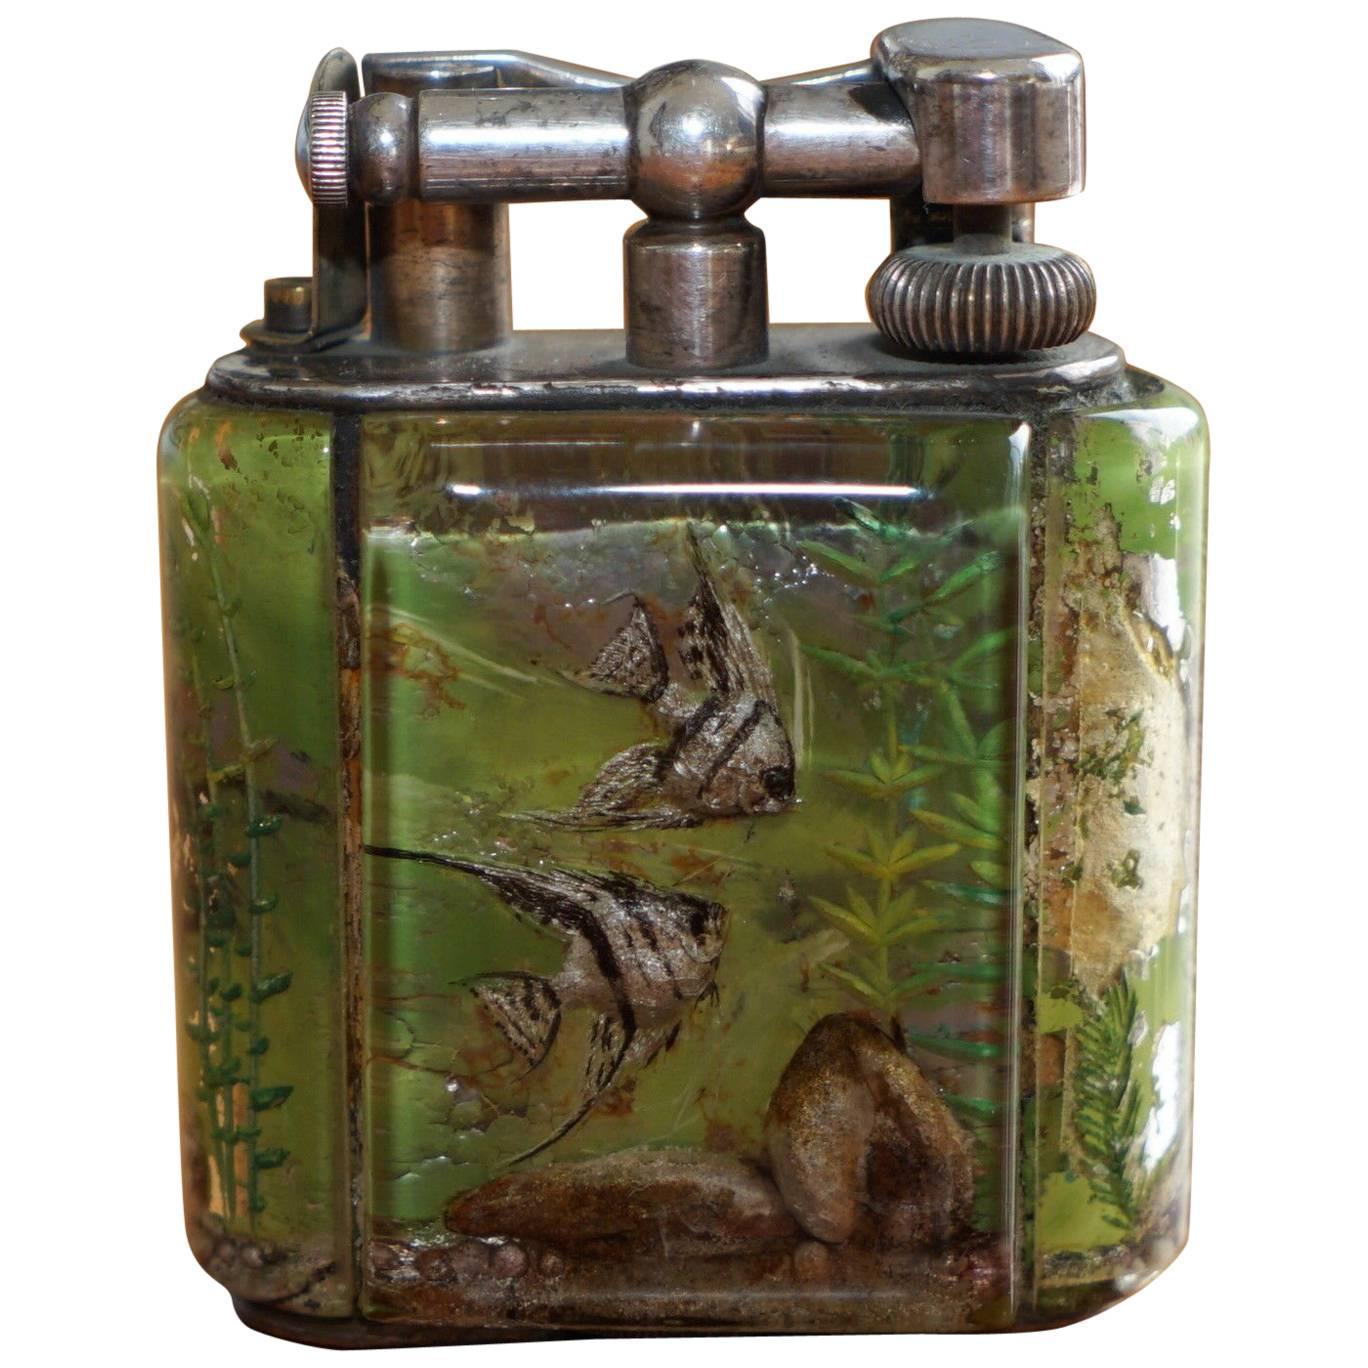 Super Rare 1950s Original Dunhill Aquarium Table Lighter Handmade in England